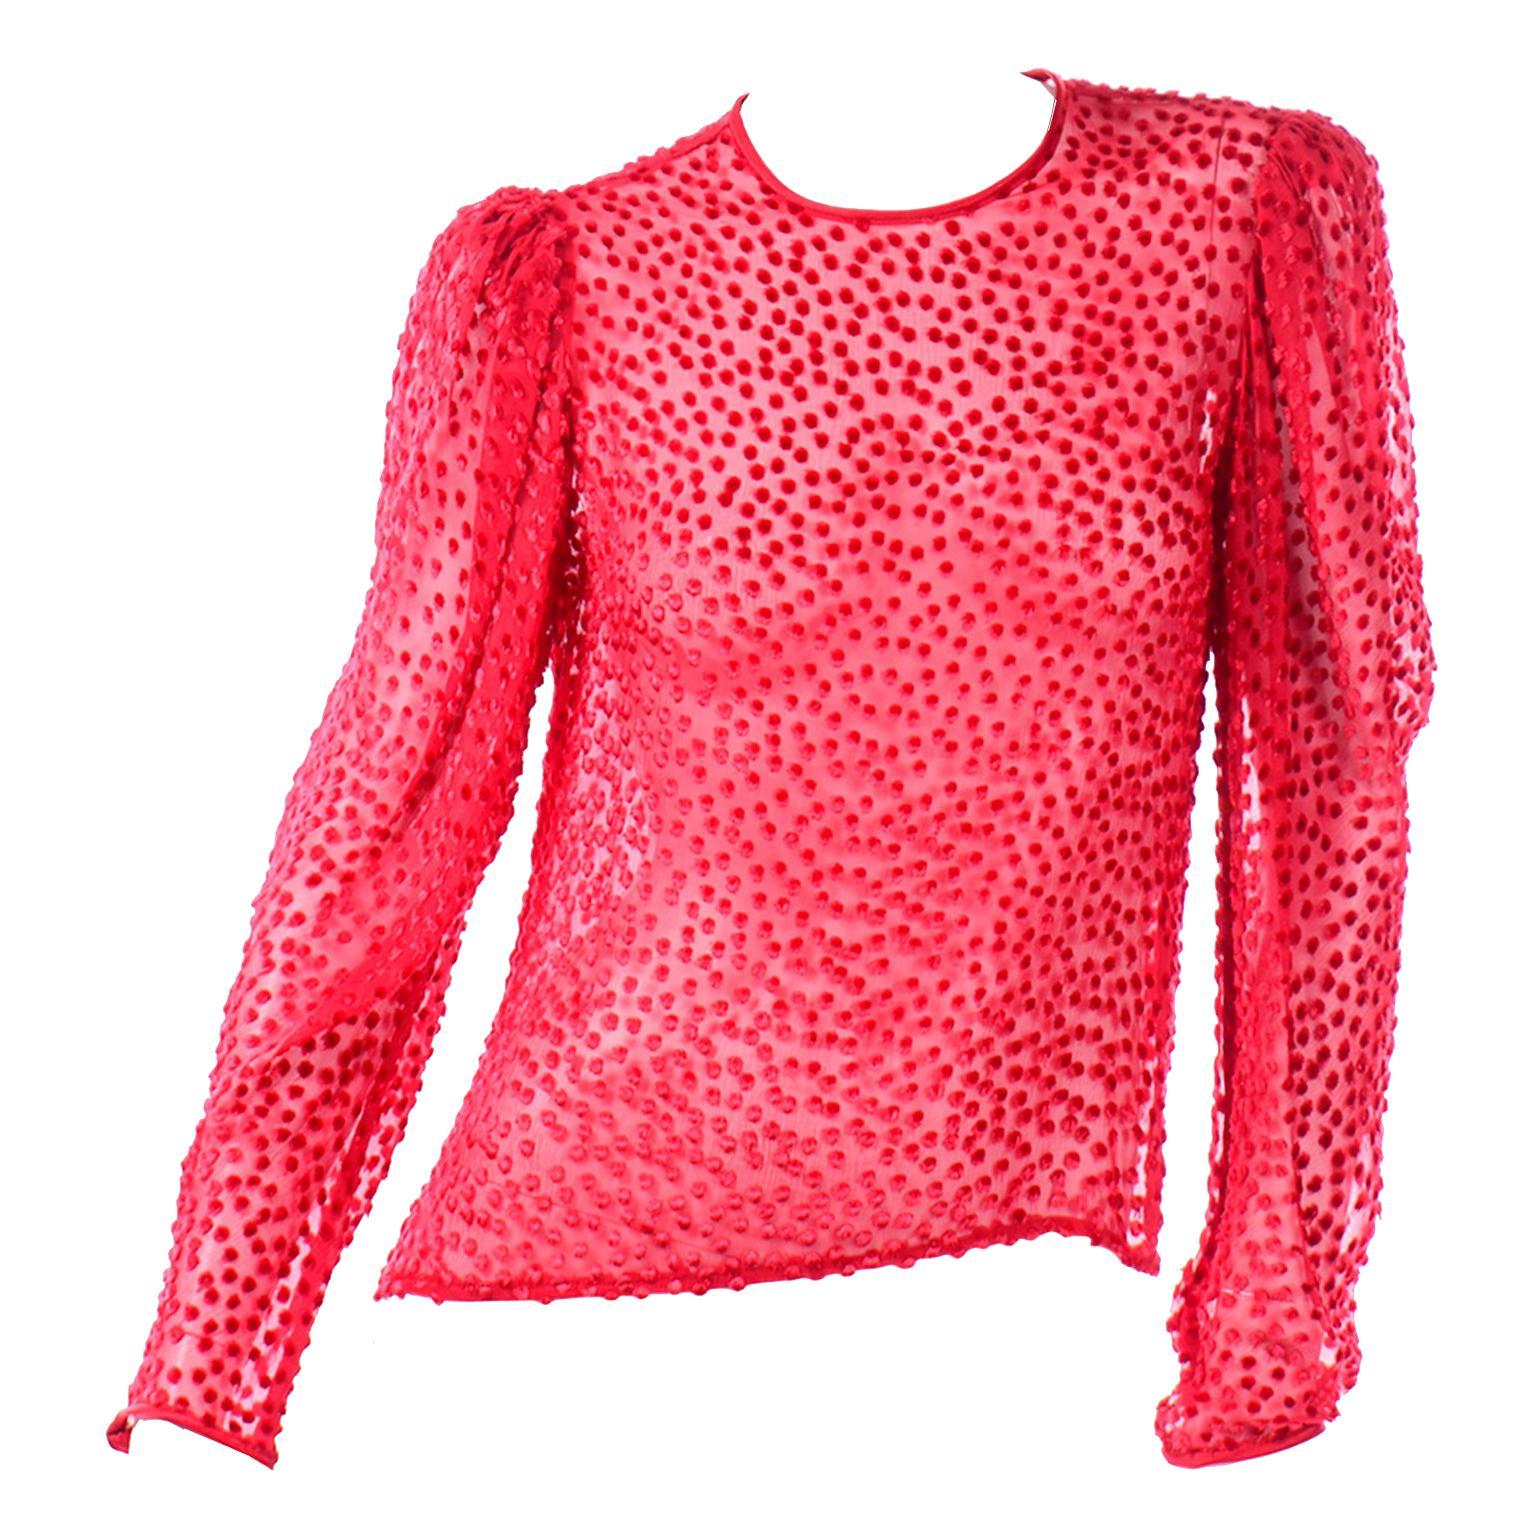 Anne Klein Vintage Top Sheer Silk Dot Red Blouse